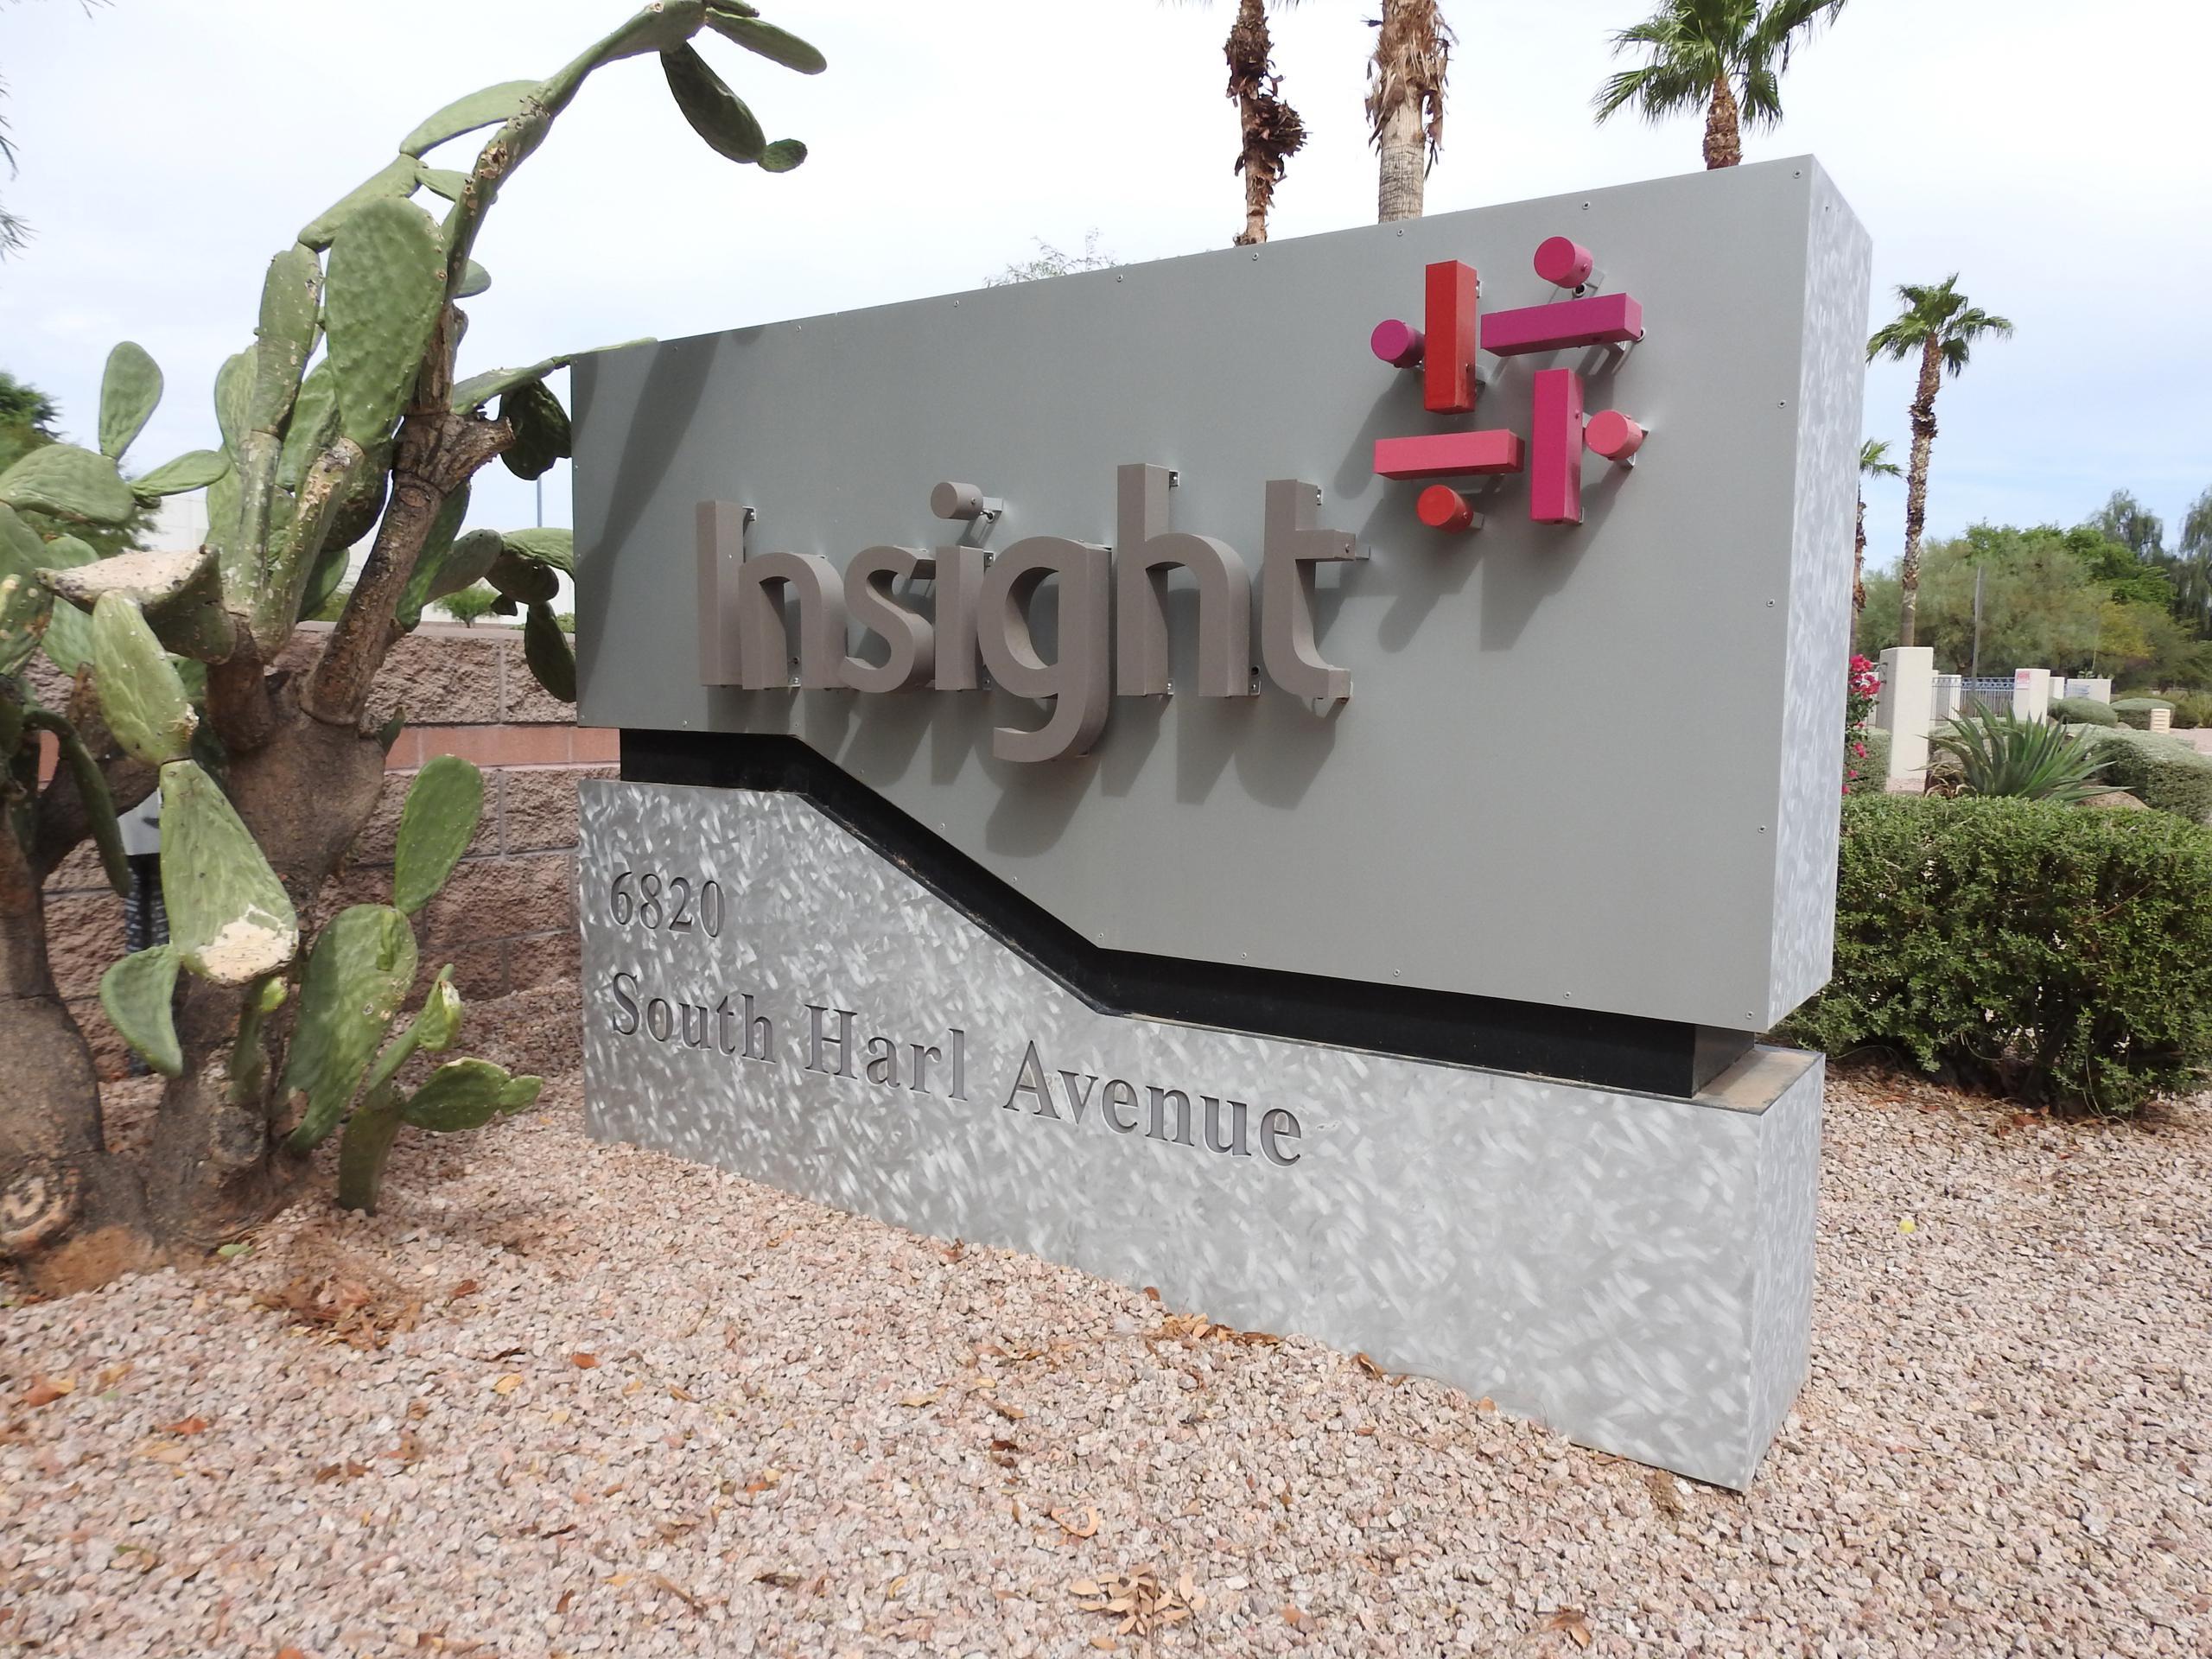 Entrance to Insight Enterprise's corporate headquarters in Tempe, Arizona.